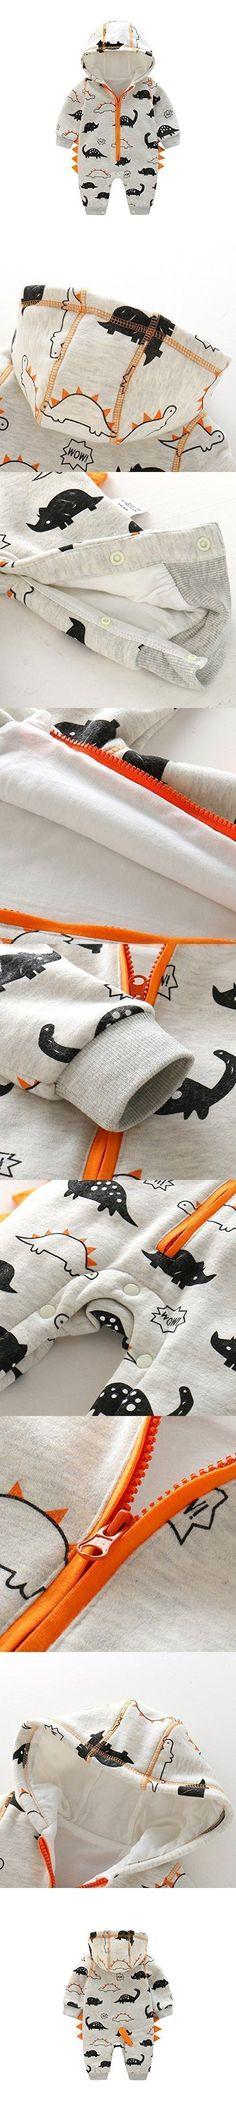 Newborn Baby Boy Baby Girl Unisex Clothes Long Sleeve Dinosaur Hoodies Winter Warm Romper outfit 3-6 months #babyboyhoodies #babygirlhoodie #babyboylongsleeve #babygirlhoodies #babyhoodies #babyboyoutfits #babygirloutfits